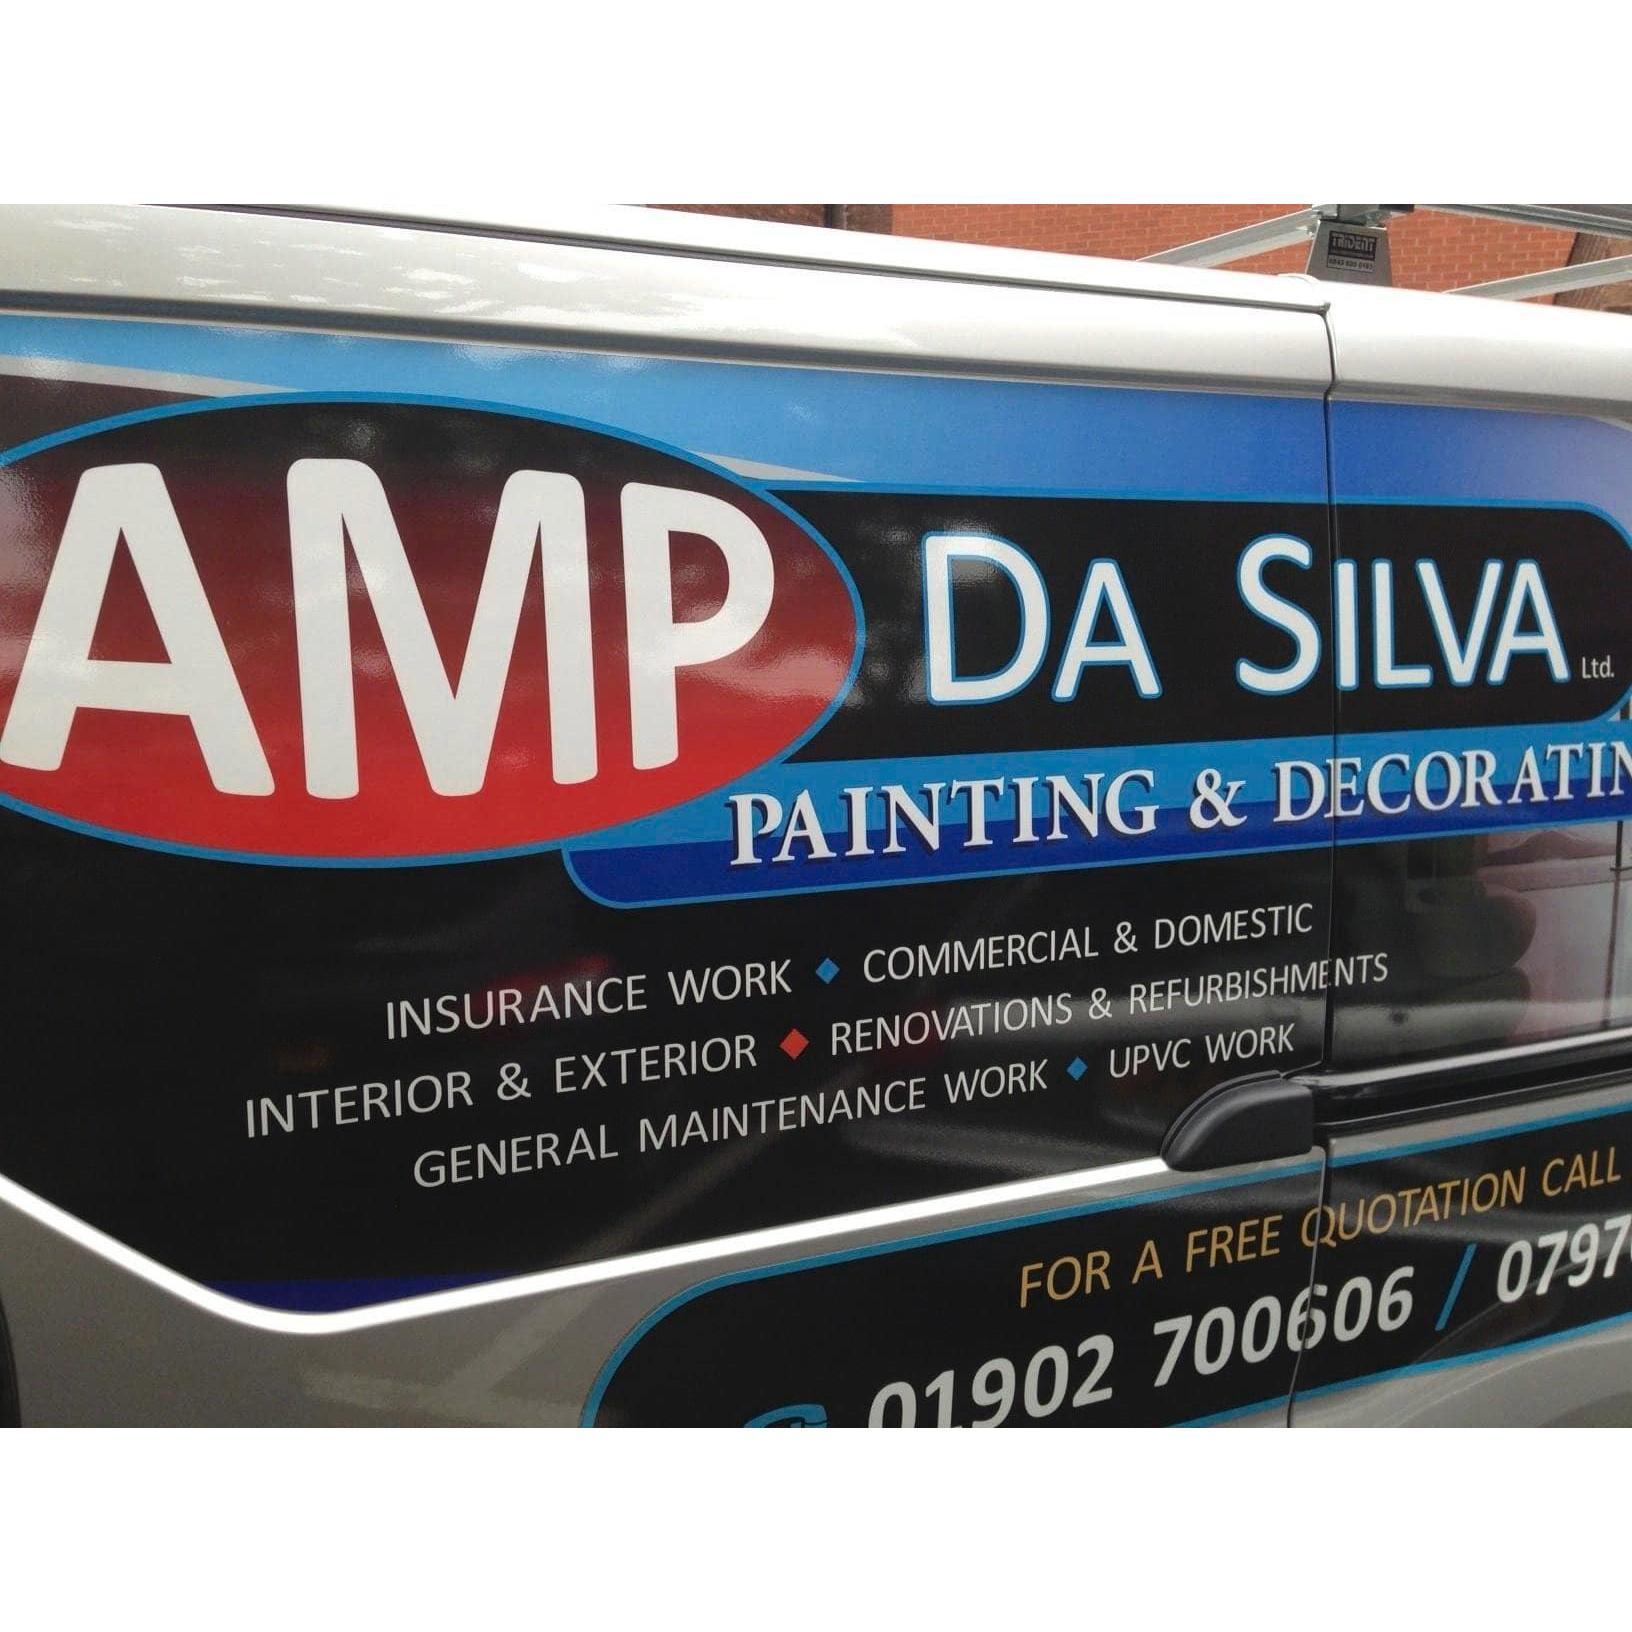 AMP Da Silva Painting & Decorating Ltd - Wolverhampton, Staffordshire WV5 9DJ - 07970 794866   ShowMeLocal.com